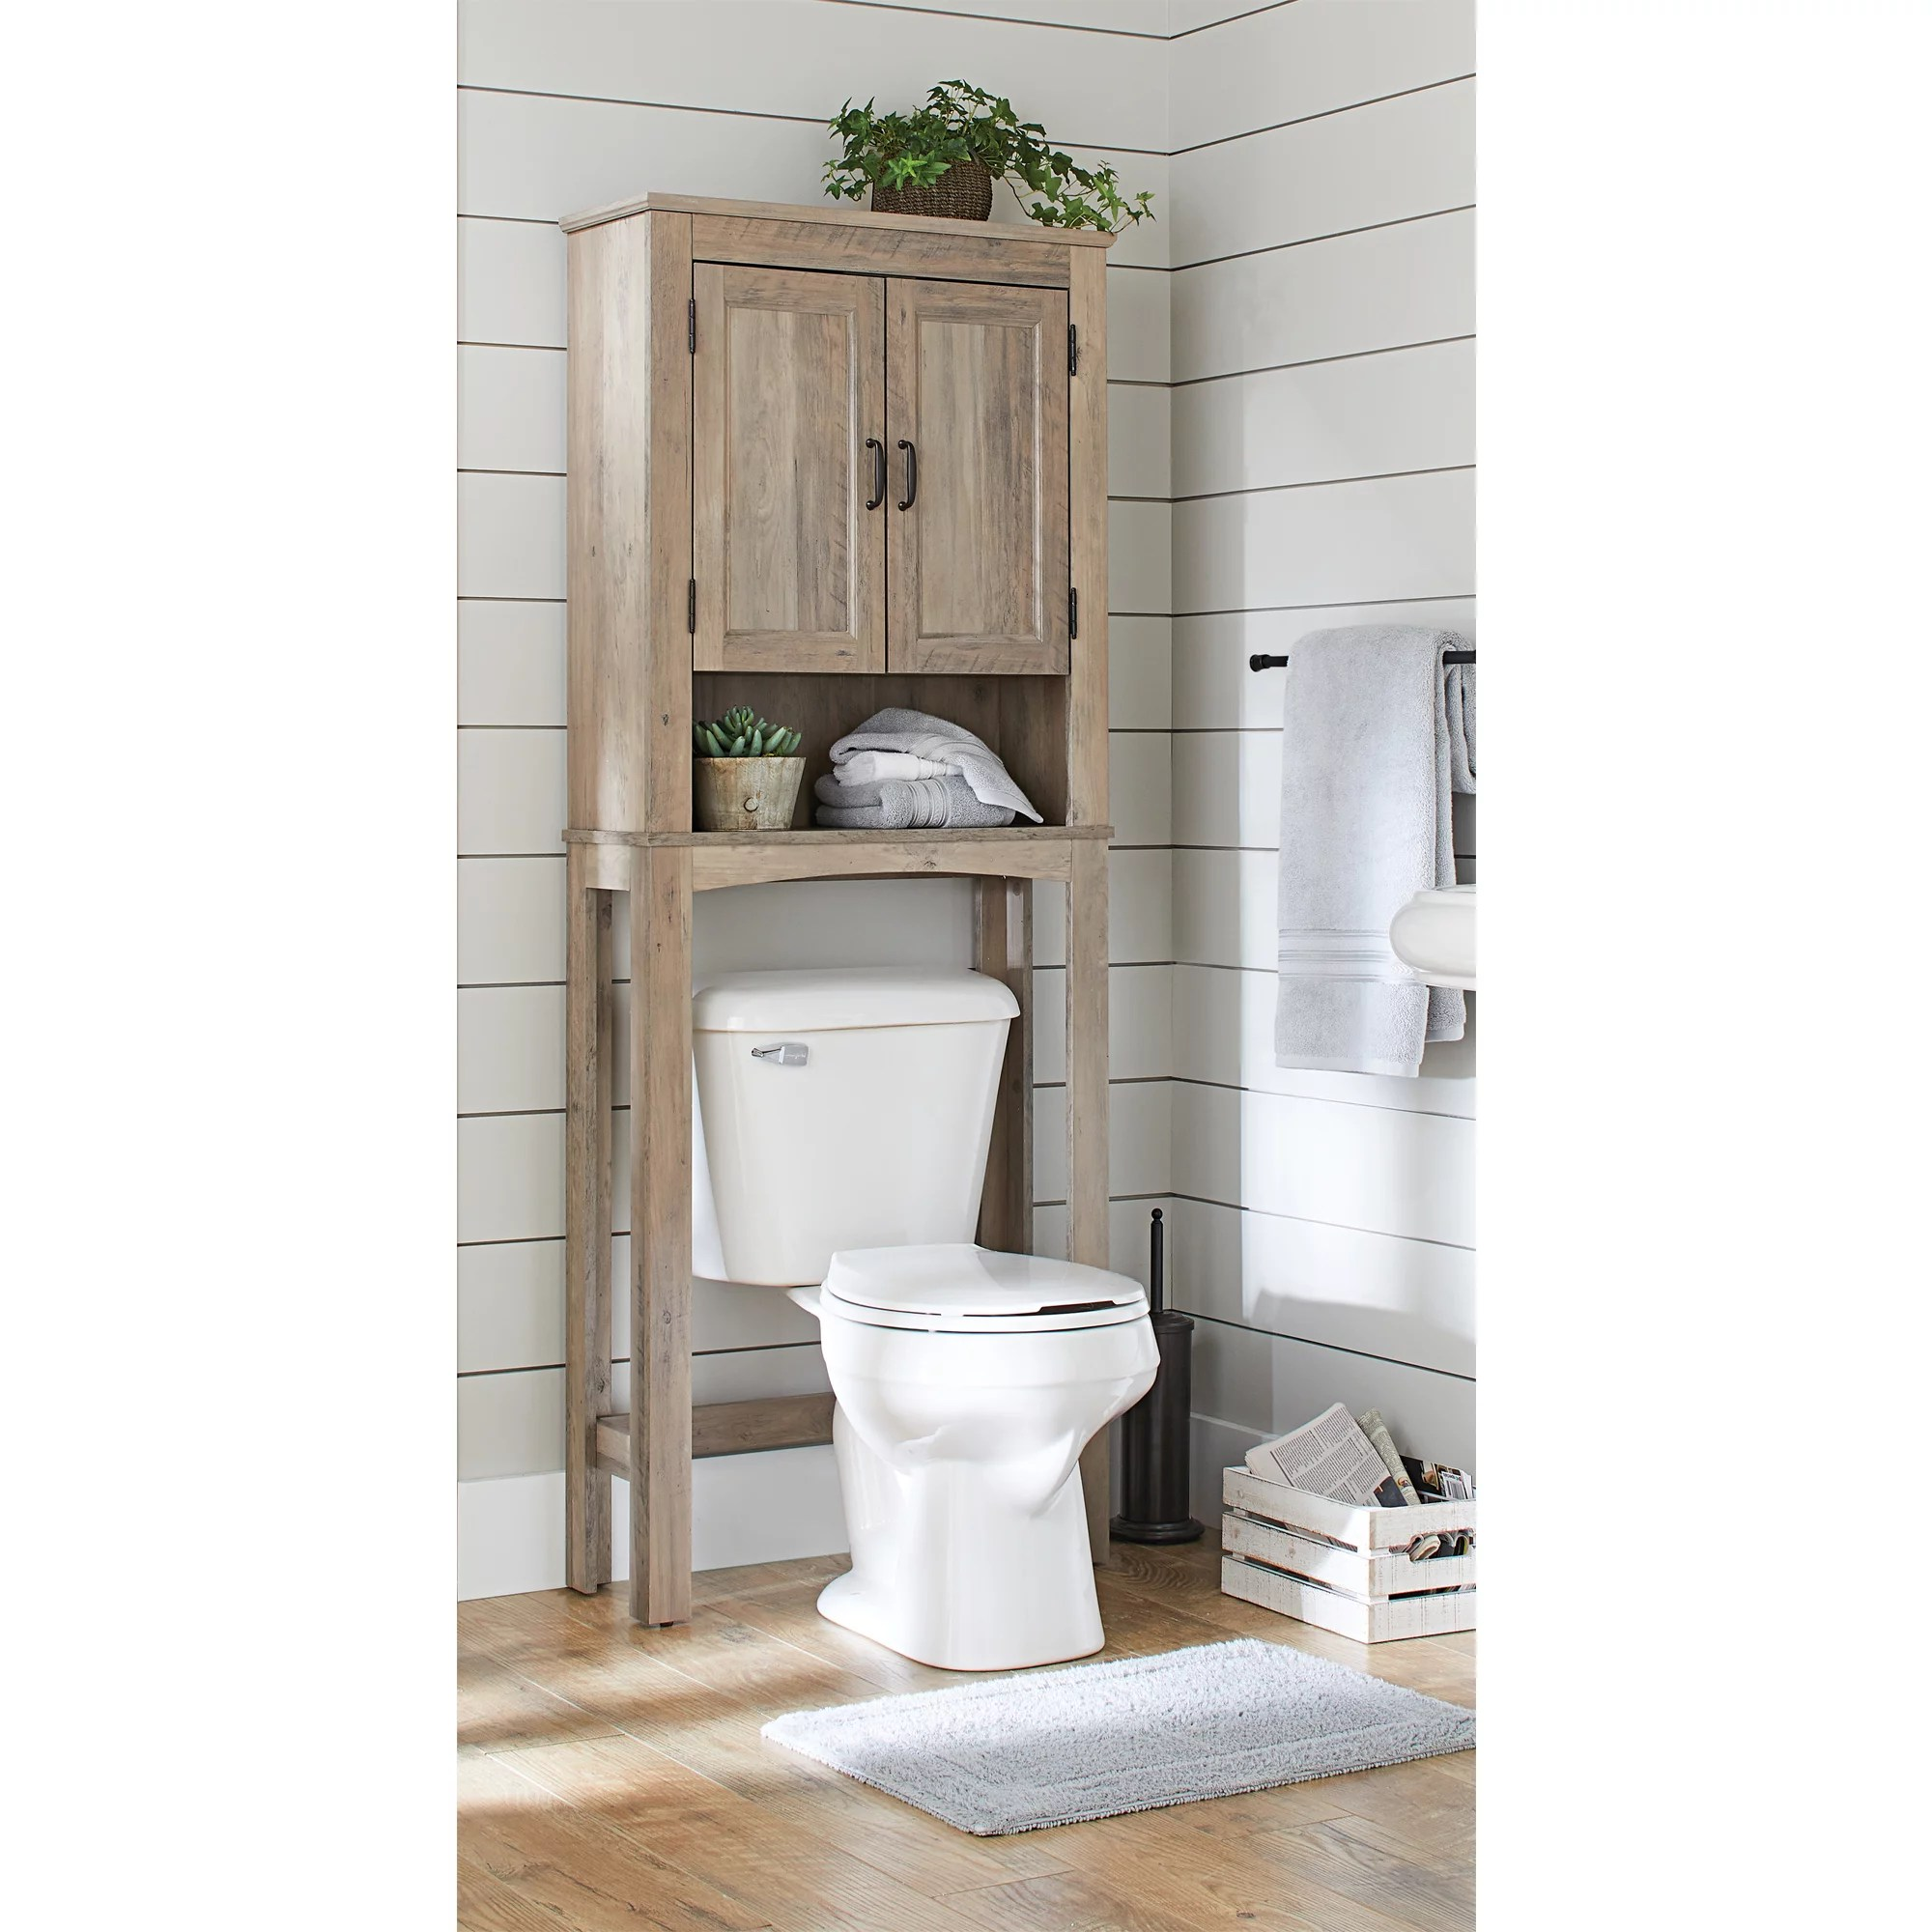 Better Homes Gardens Modern Farmhouse Over The Toilet Bathroom Space Saver With Three Fixed Shelves Rustic Gray Finish Walmart Com Walmart Com